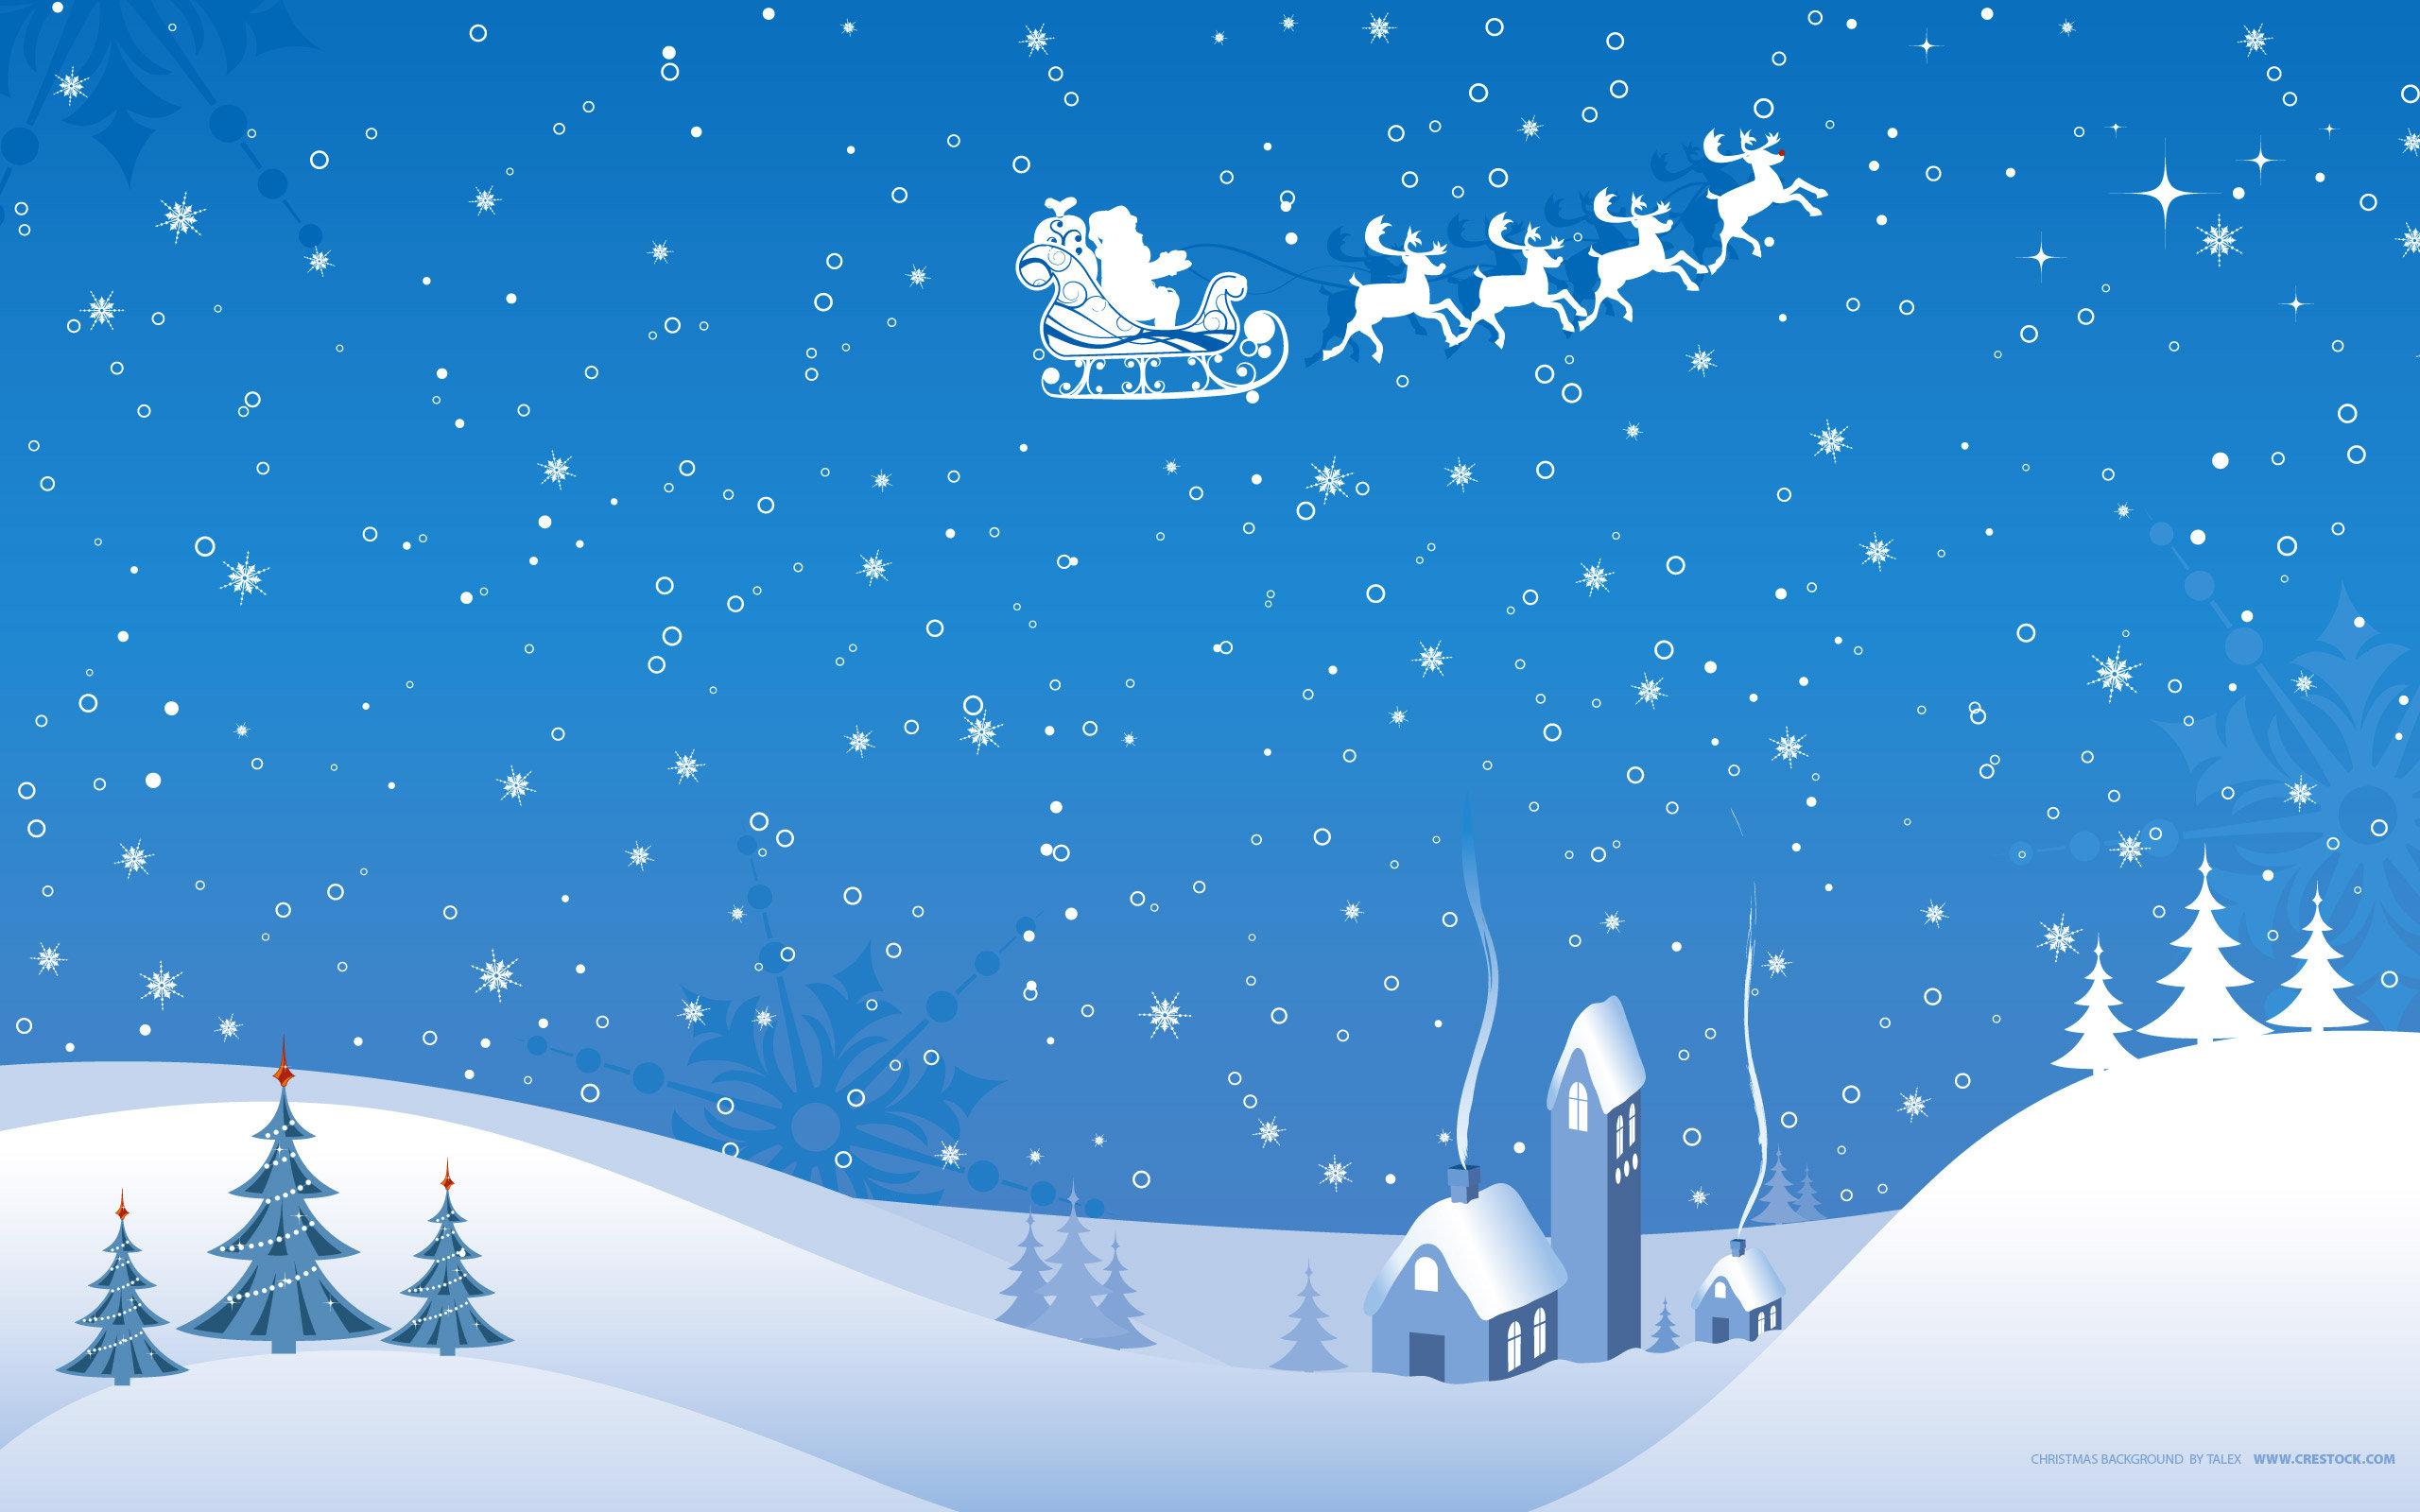 Winter House Christmas Snow Wallpaper Scenes Wallpapersafari